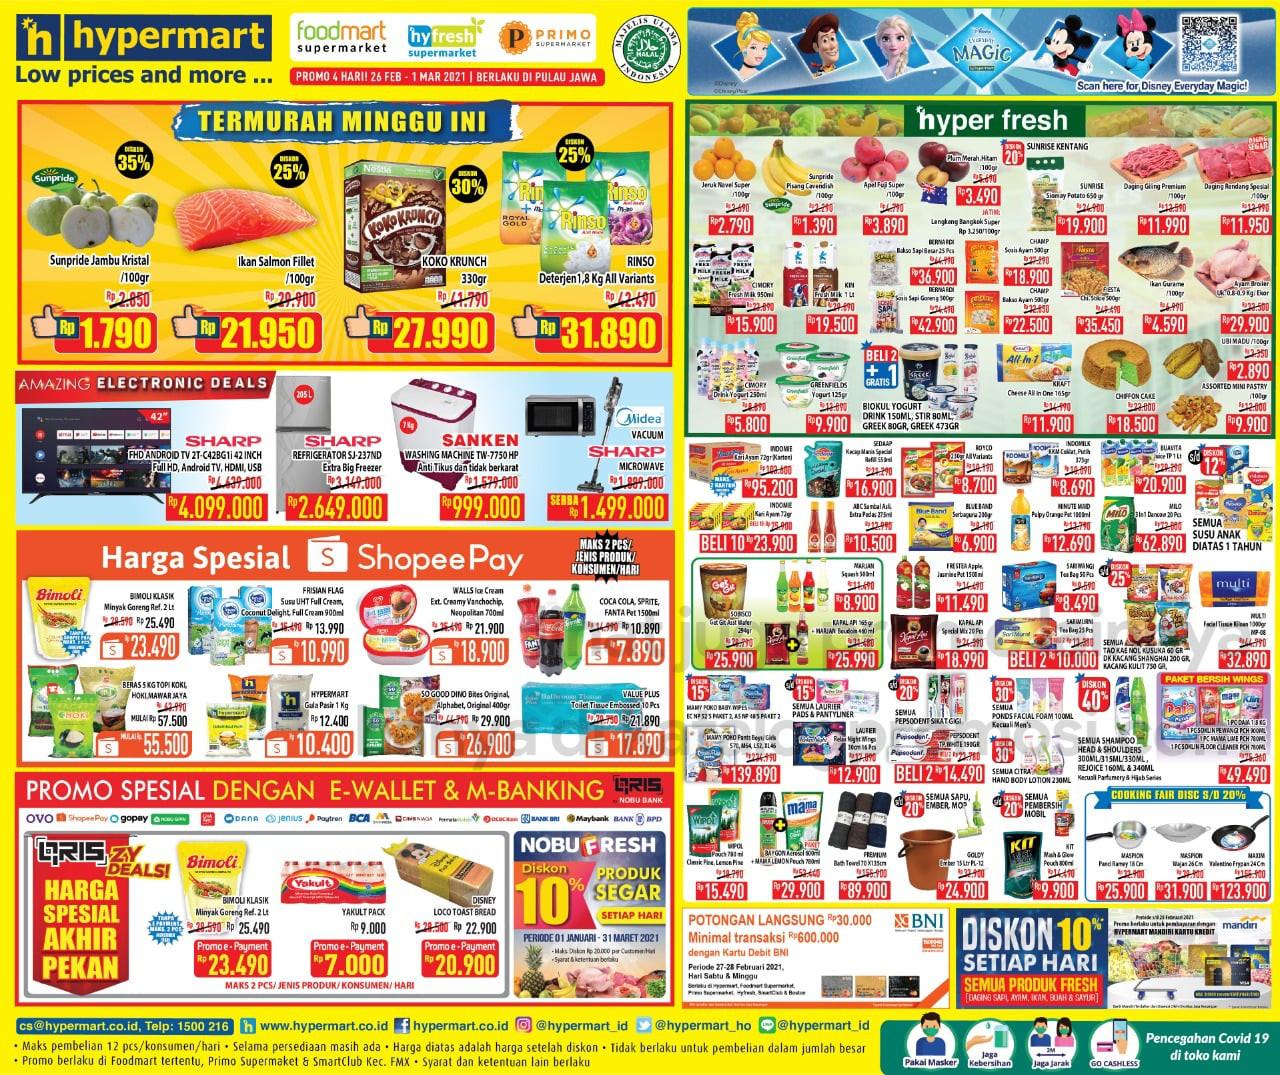 Promo Hypermart JSM Katalog Weekend periode 26 Februari - 01 Maret 2021